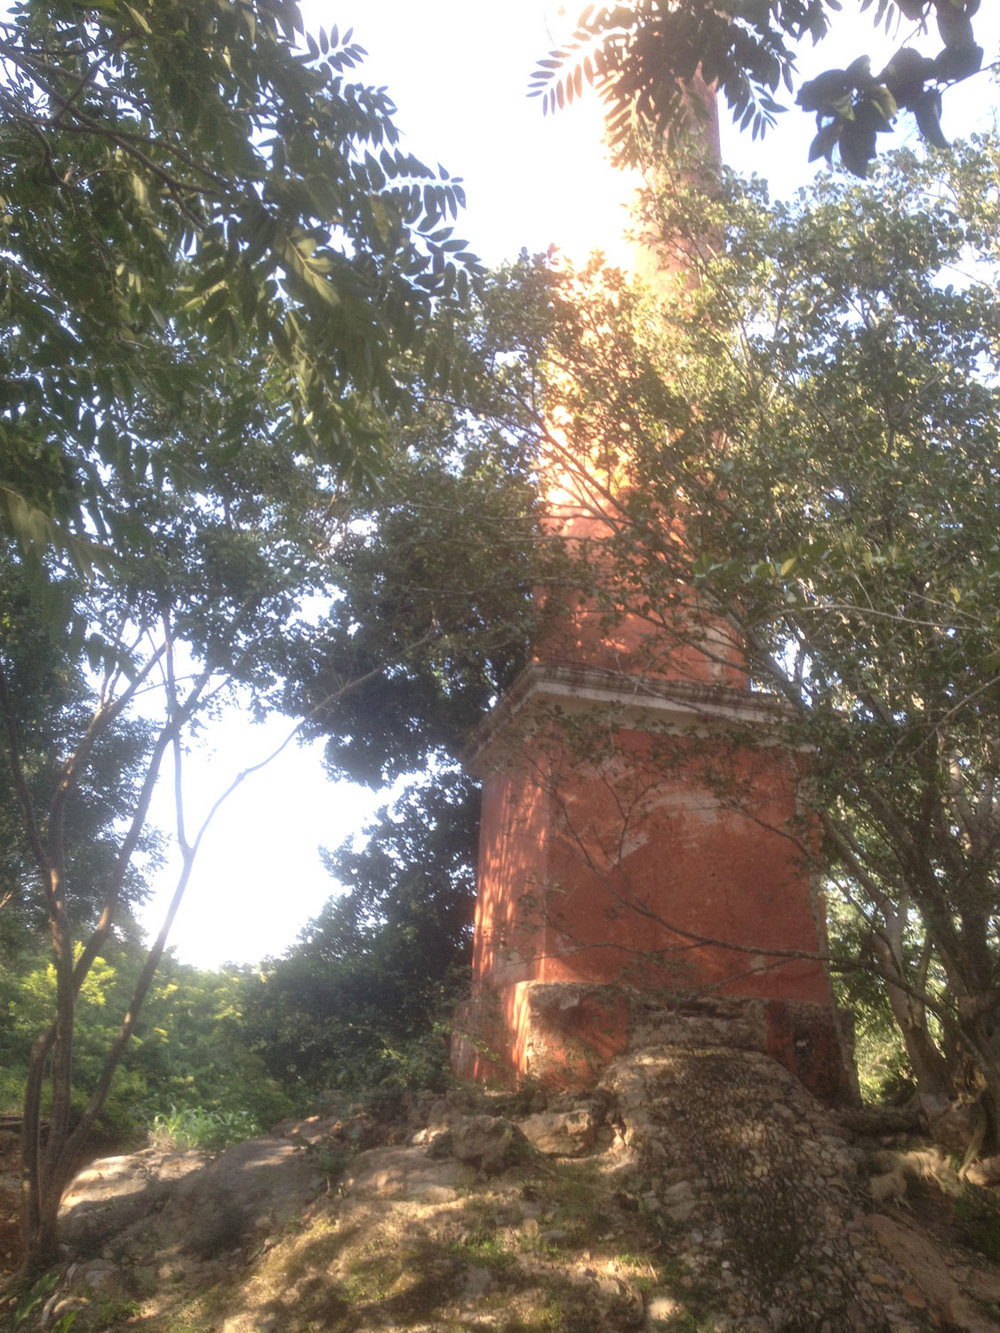 Hammocks_and_Ruins_Blog_Riviera_Maya_Mexico_Travel_Discover_Yucatan_What_to_do_Hacienda_Ochil_26.jpg